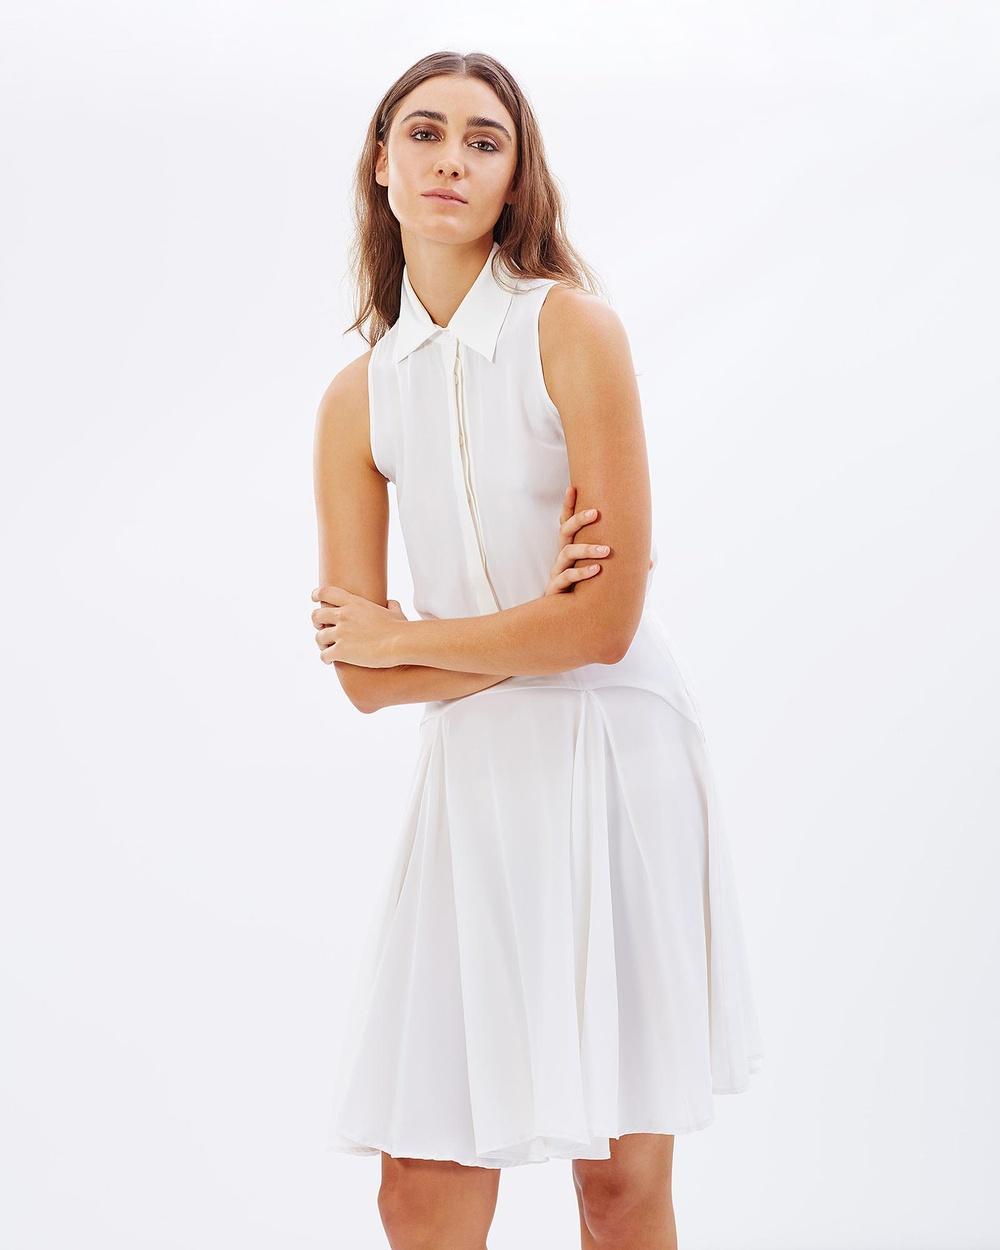 S. WALLIS Luminescence Dress Dresses White Luminescence Dress